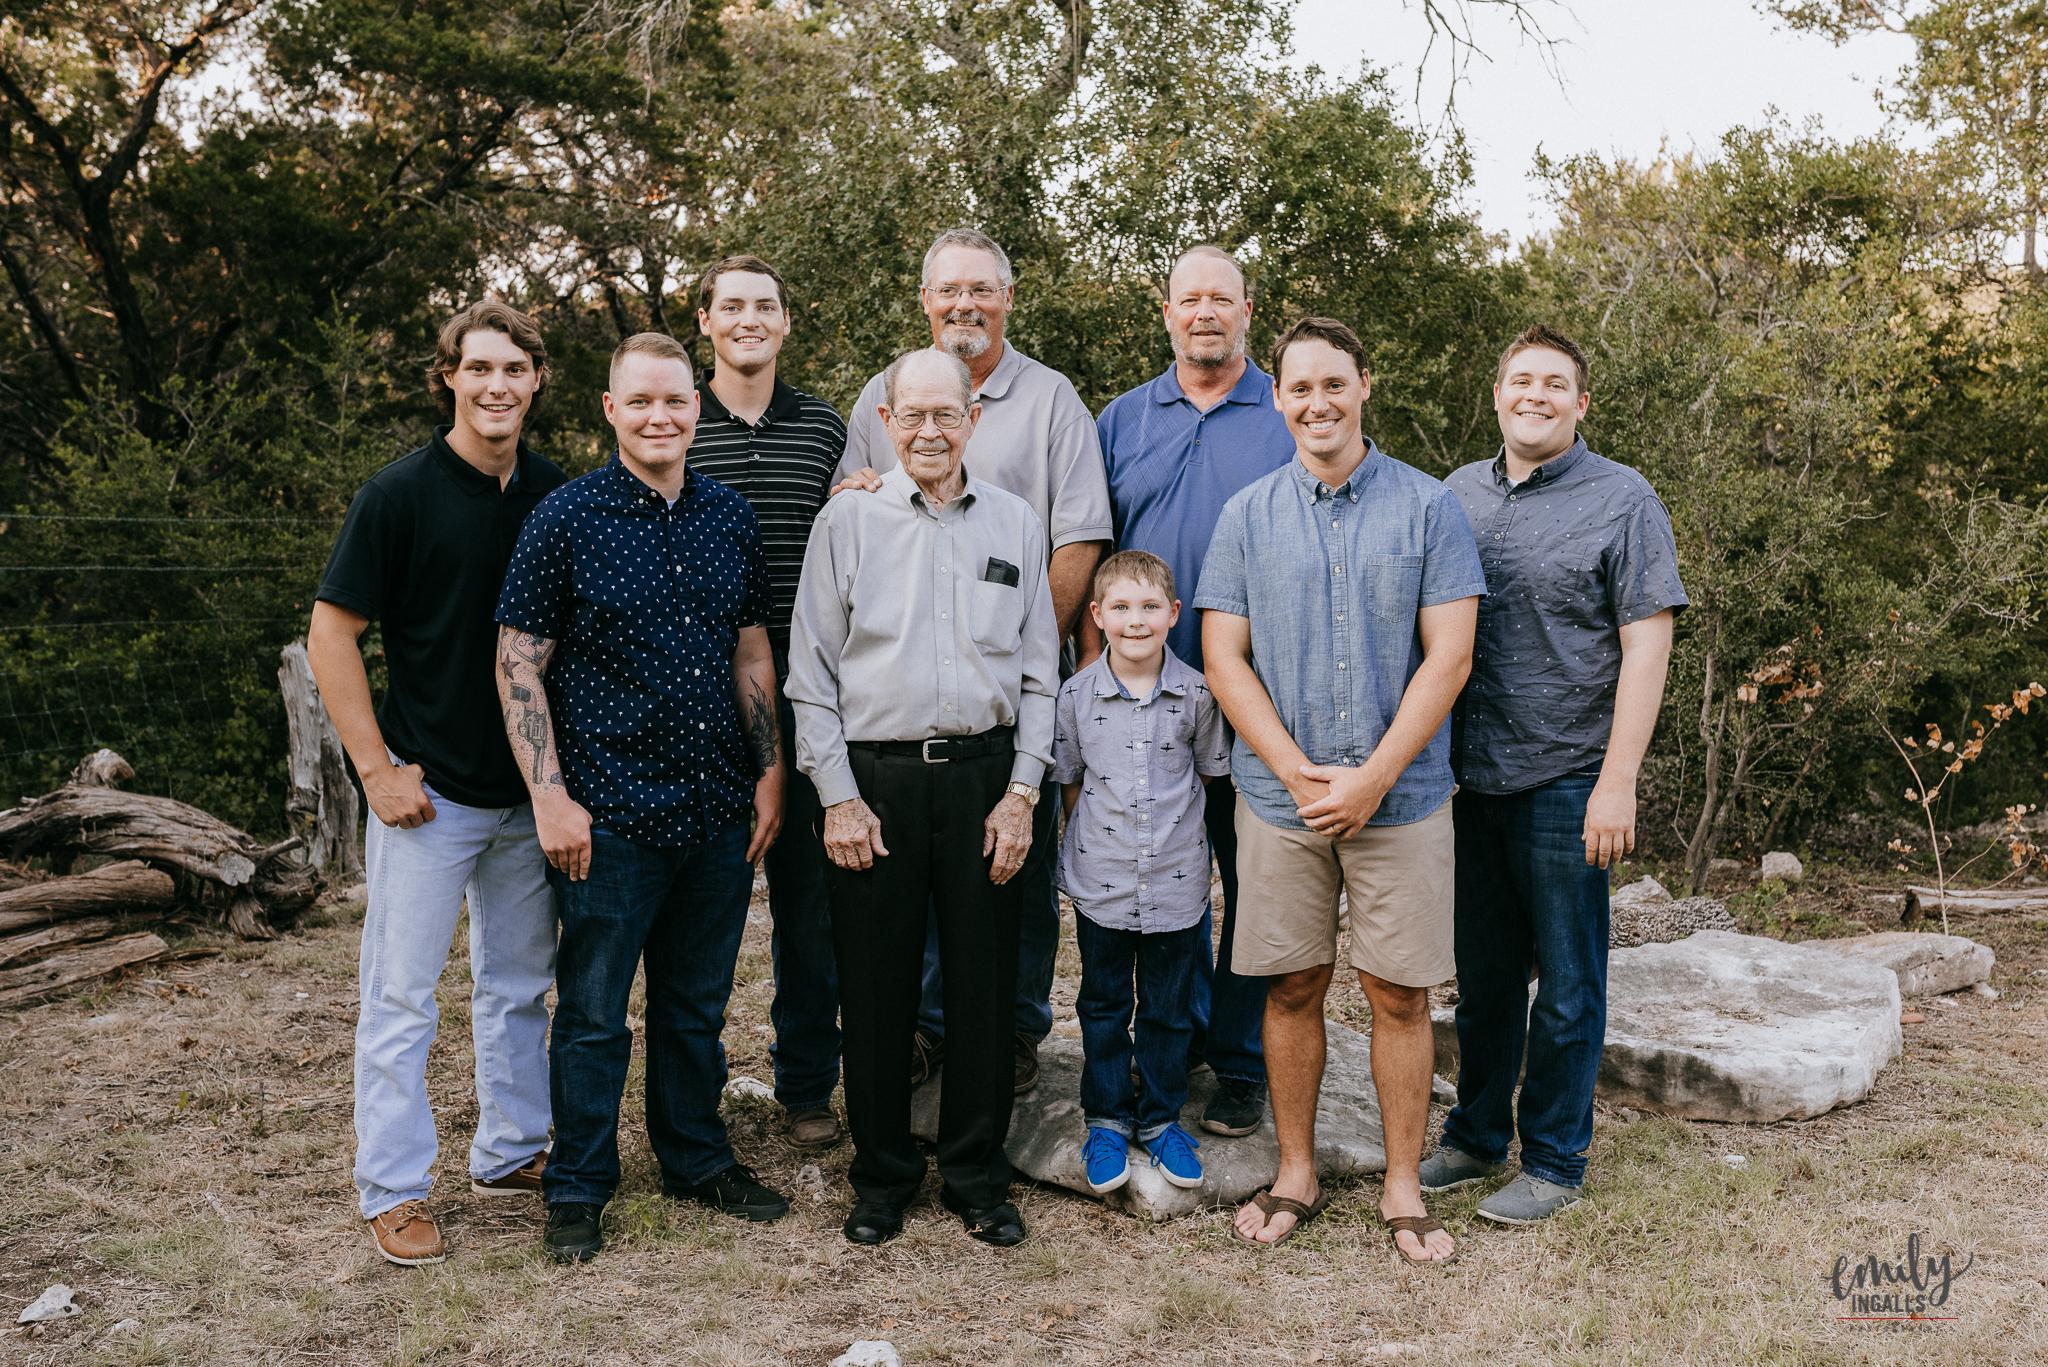 Wedding Annivesary and Family Reunion Photographer_Round Rock Photographer_Emily Ingalls Photography_Austin Photographer_Pflugerville Photographer_Georgetown Photographer_Austin Photographer-13.jpg